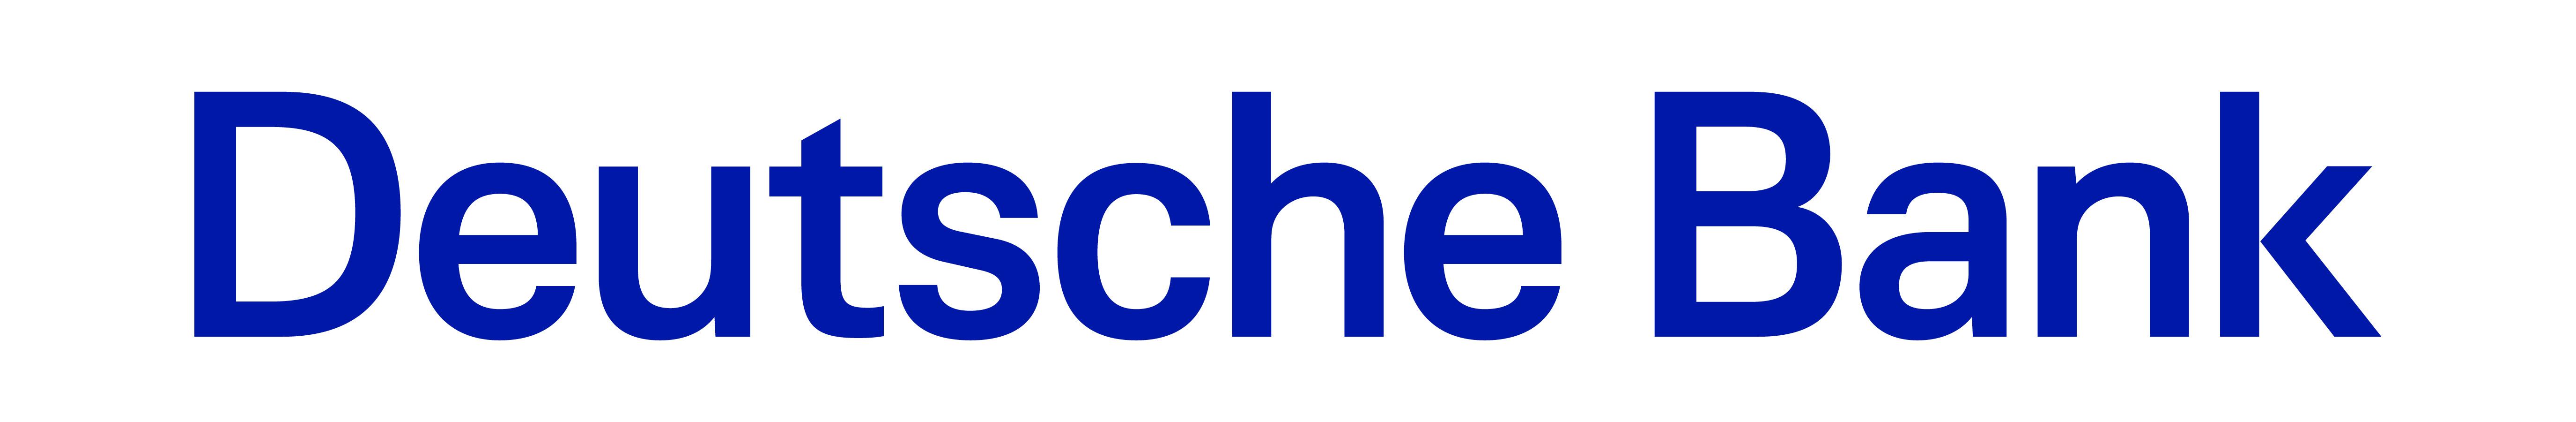 Meaning Deutsche Bank logo and symbol.